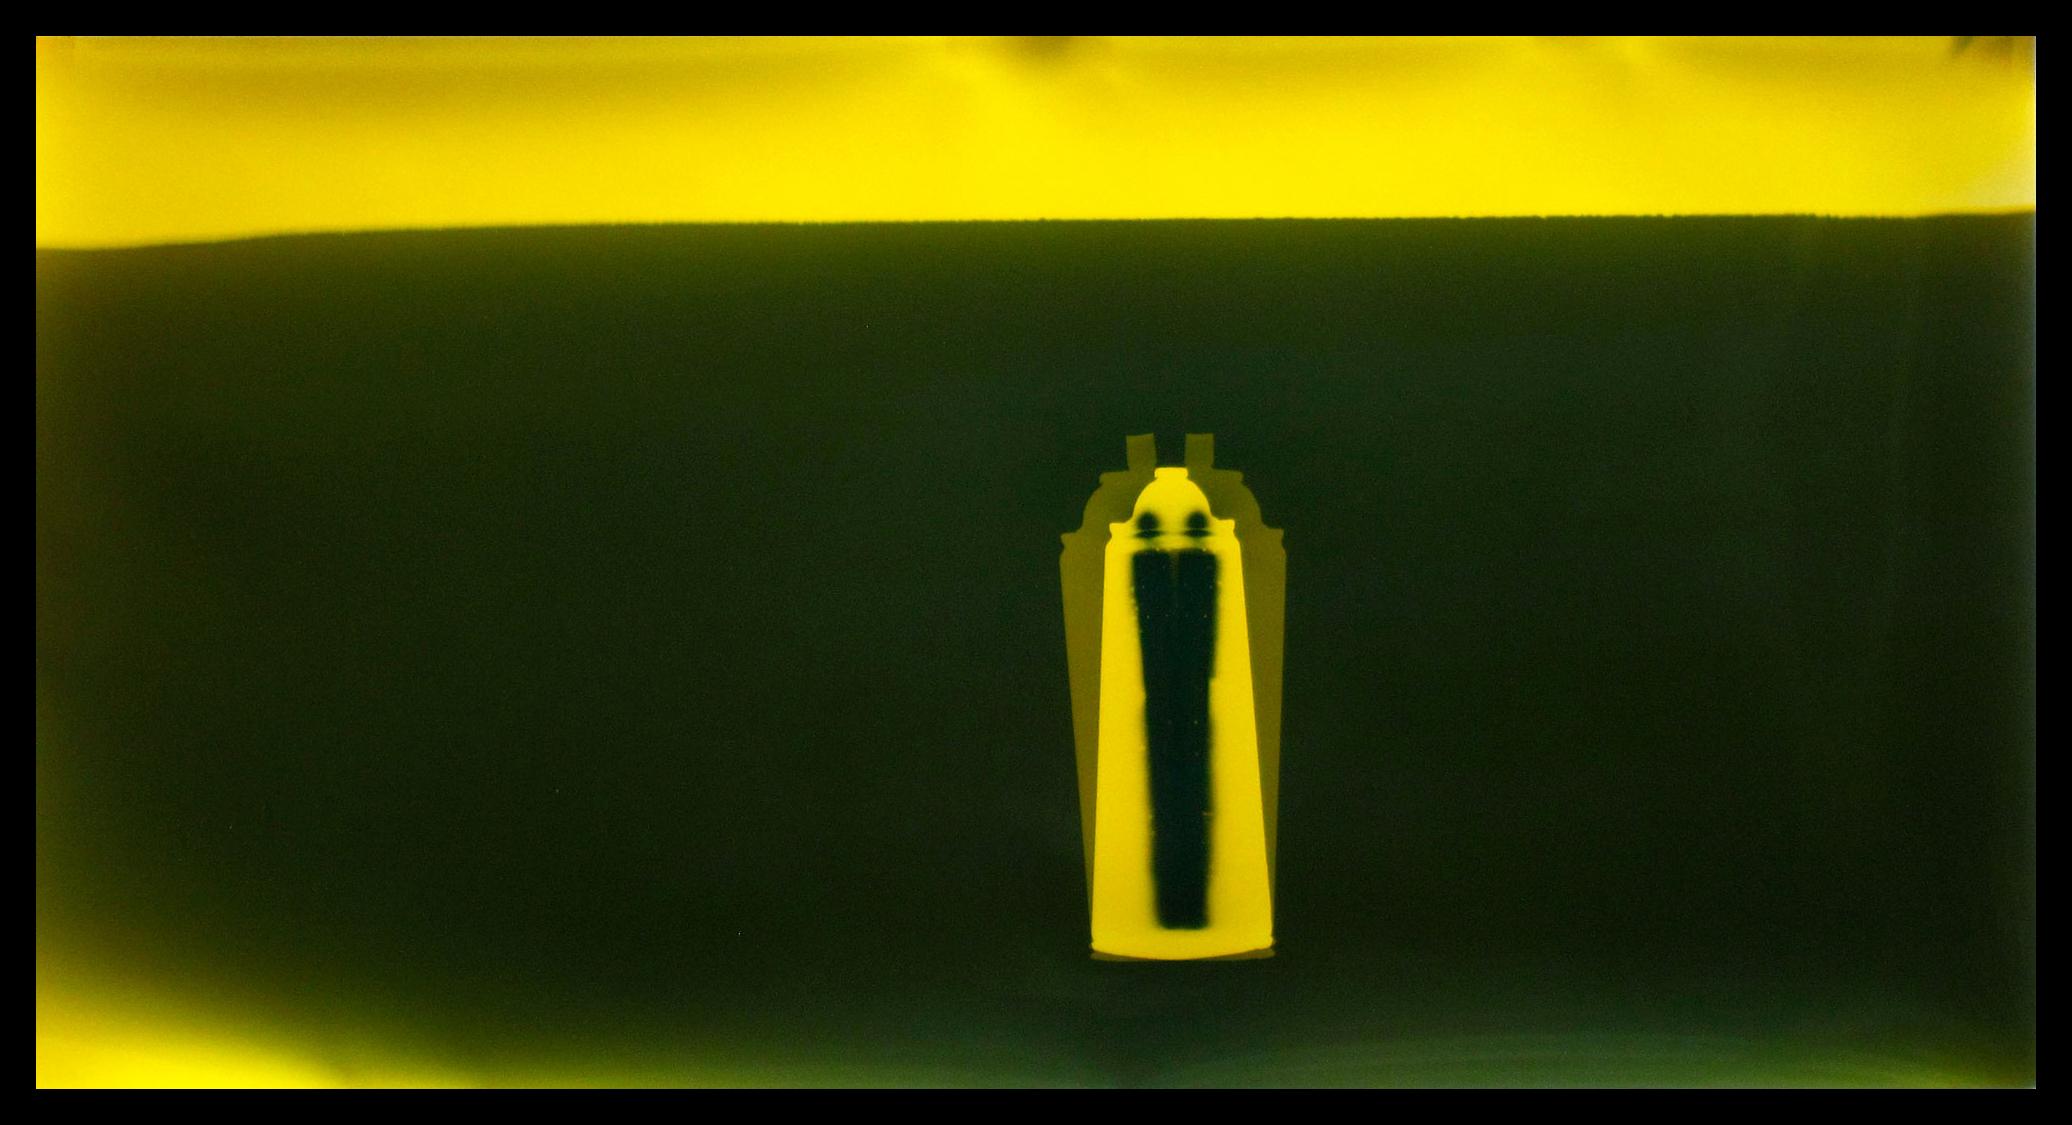 Accessory to Protest: Yellow Sprayca